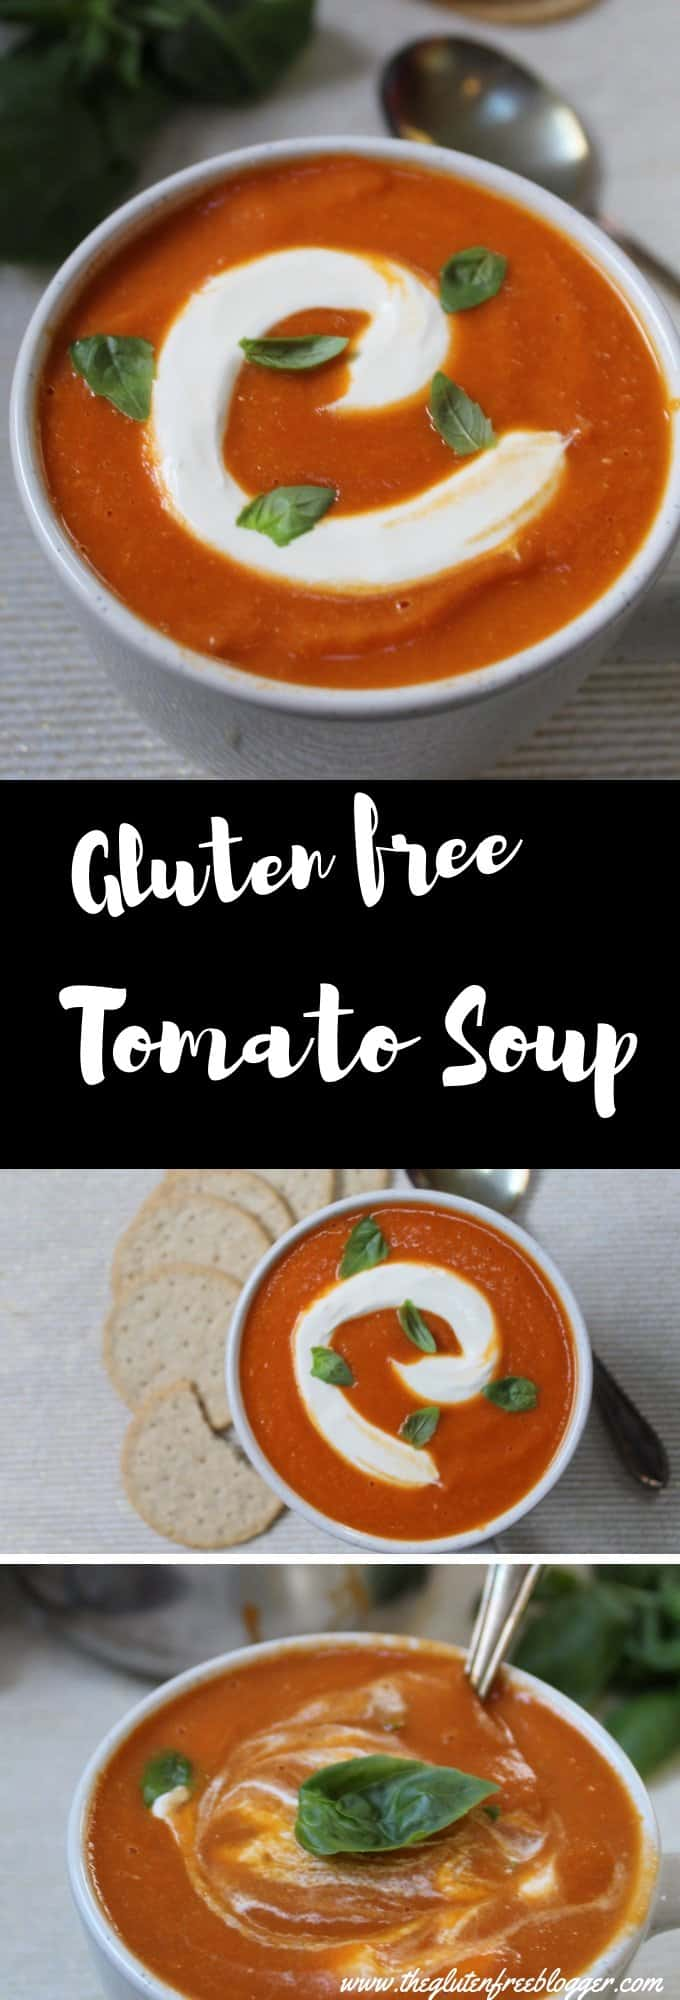 gluten free tomato soup recipe easy lunch dinner recipes